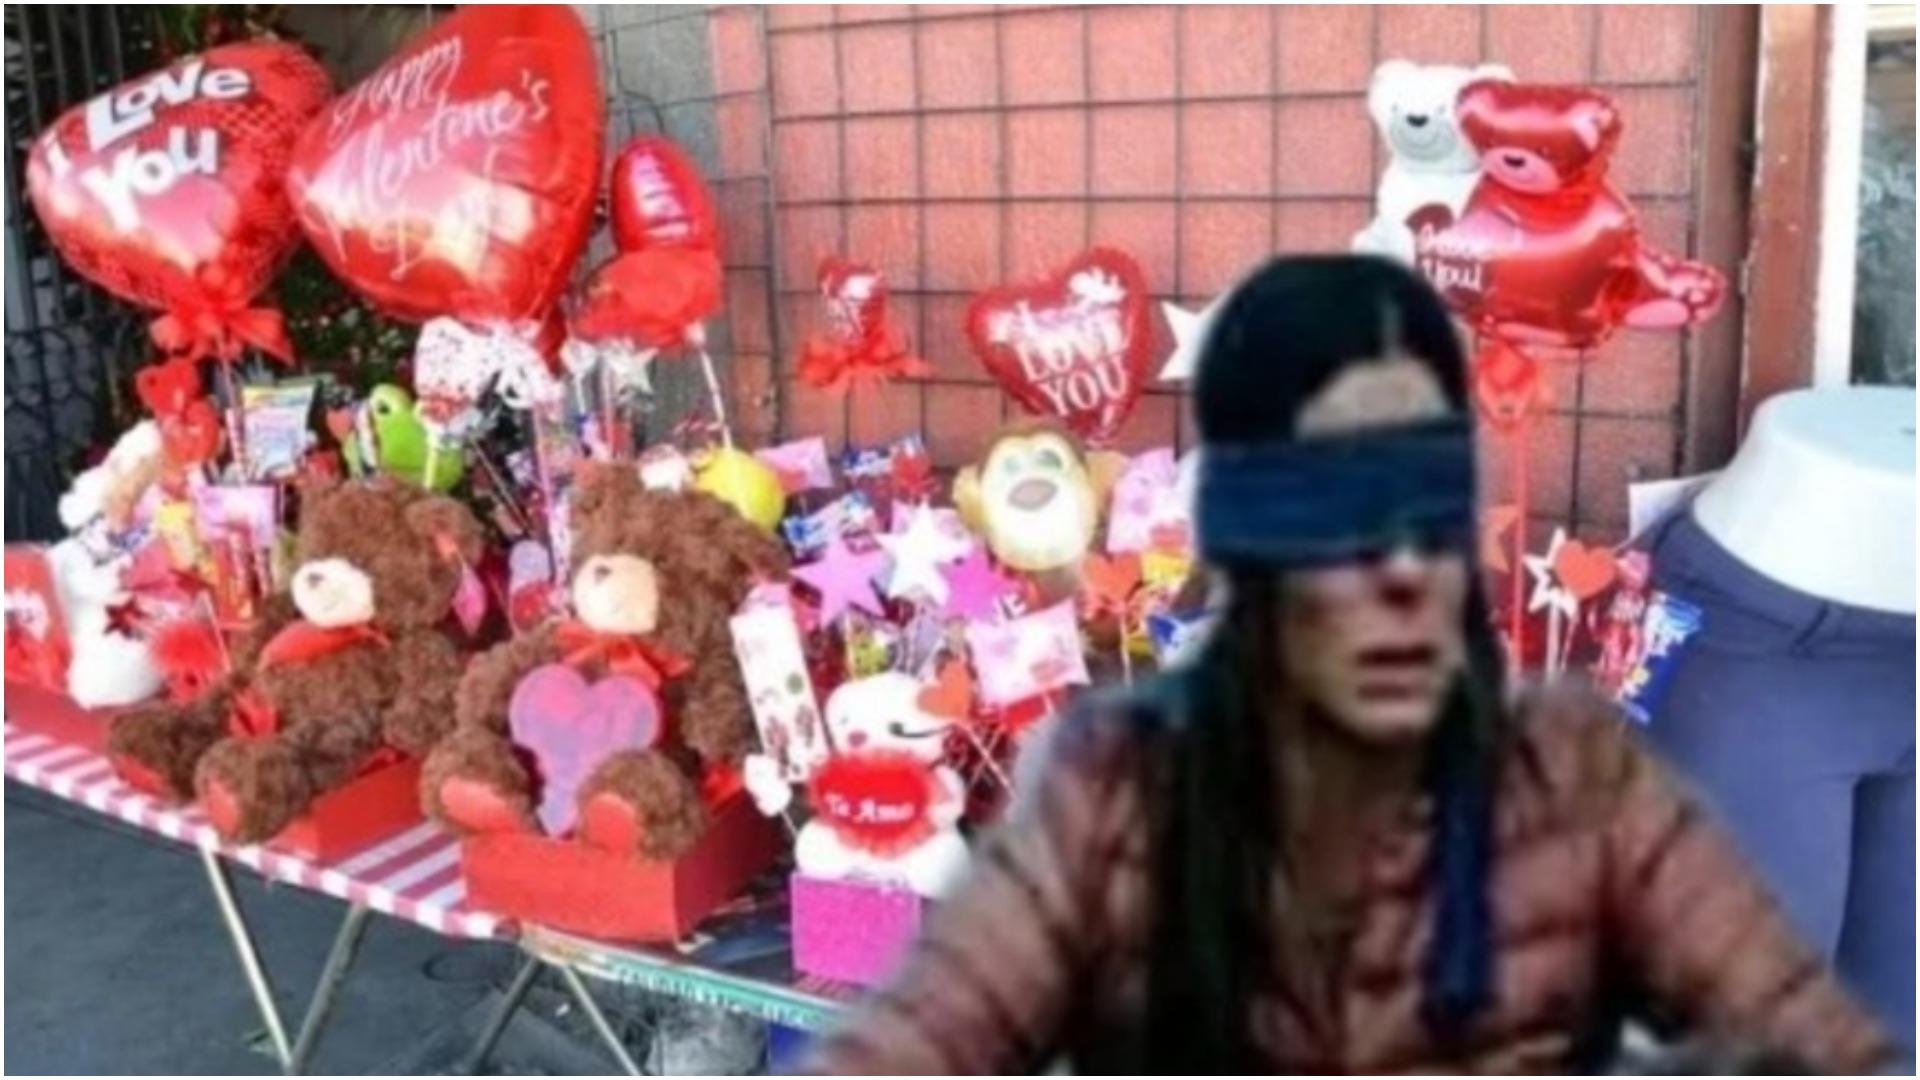 Si creías que San Valentín no iba a ser divertido, espera a ver estos memes